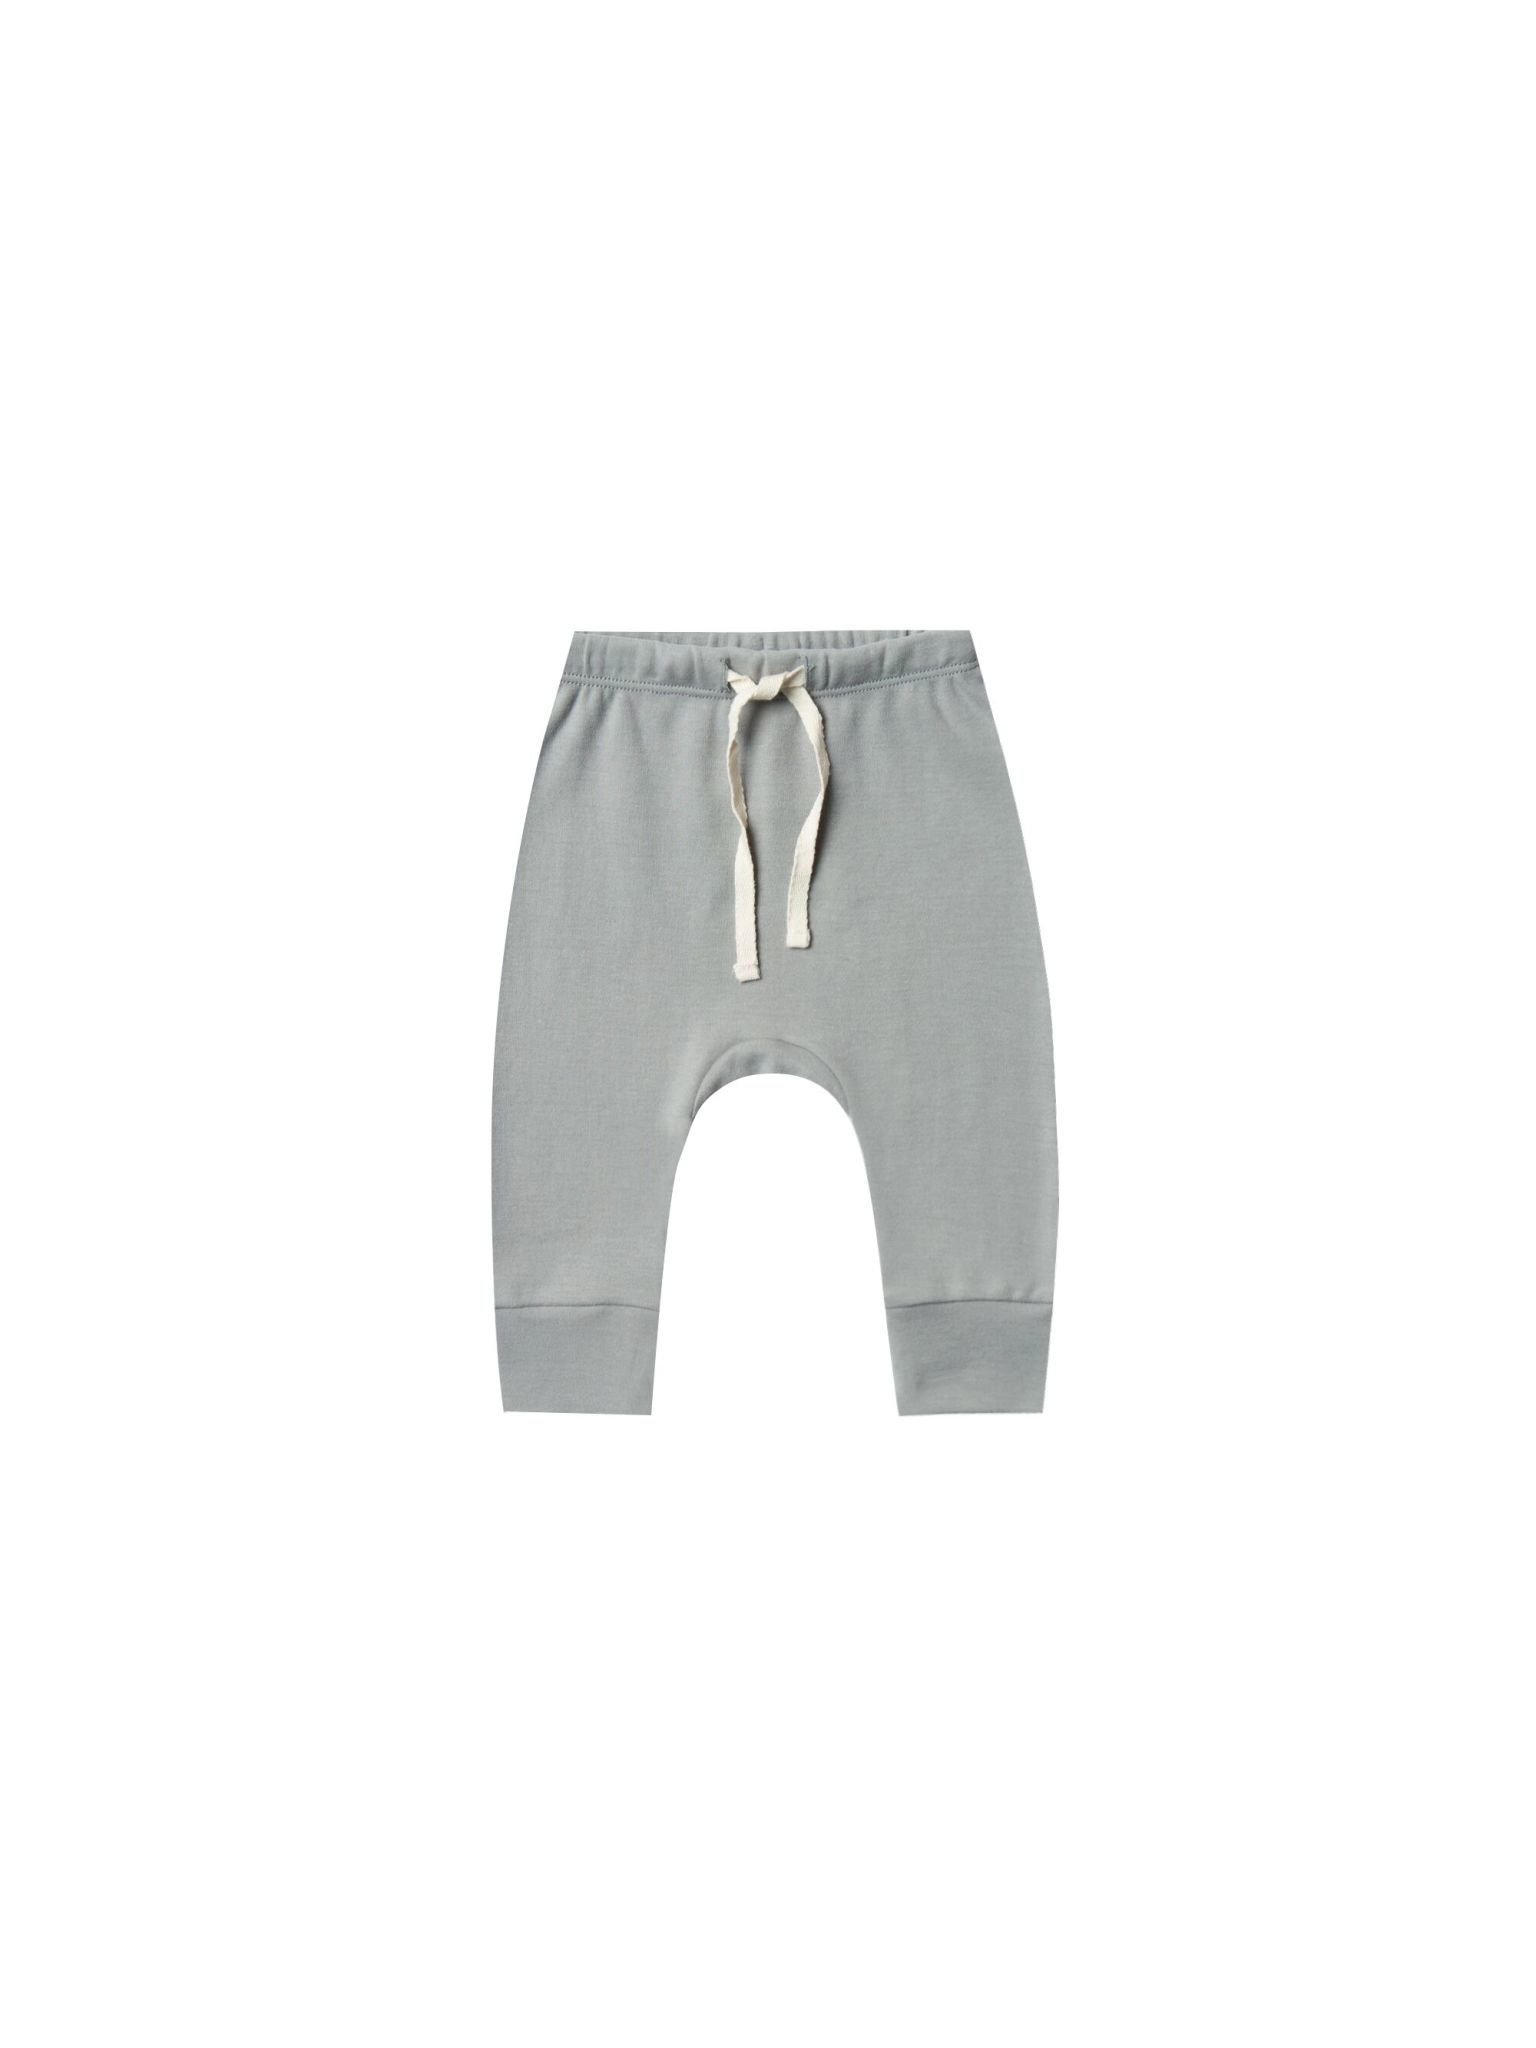 QUINCY MAE Organic Brushed Jersey Drawstring Pant